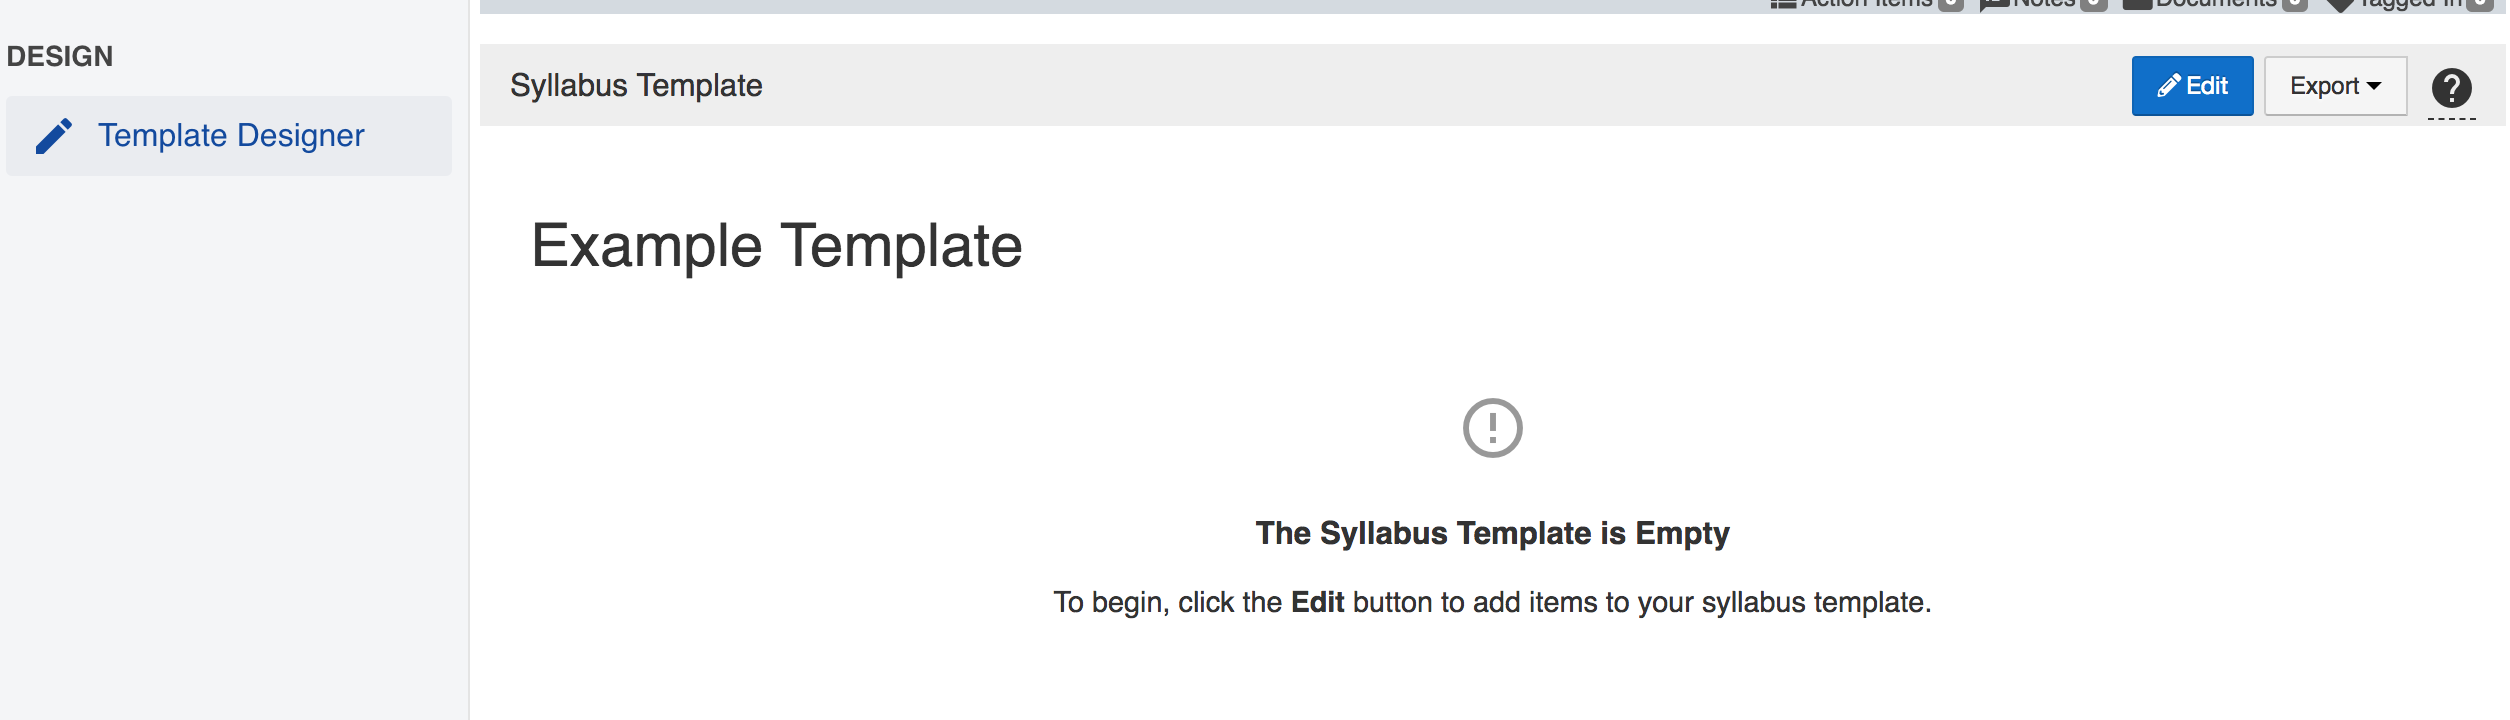 Syllabus Template | How To Create A Syllabus Template Aefis Academy